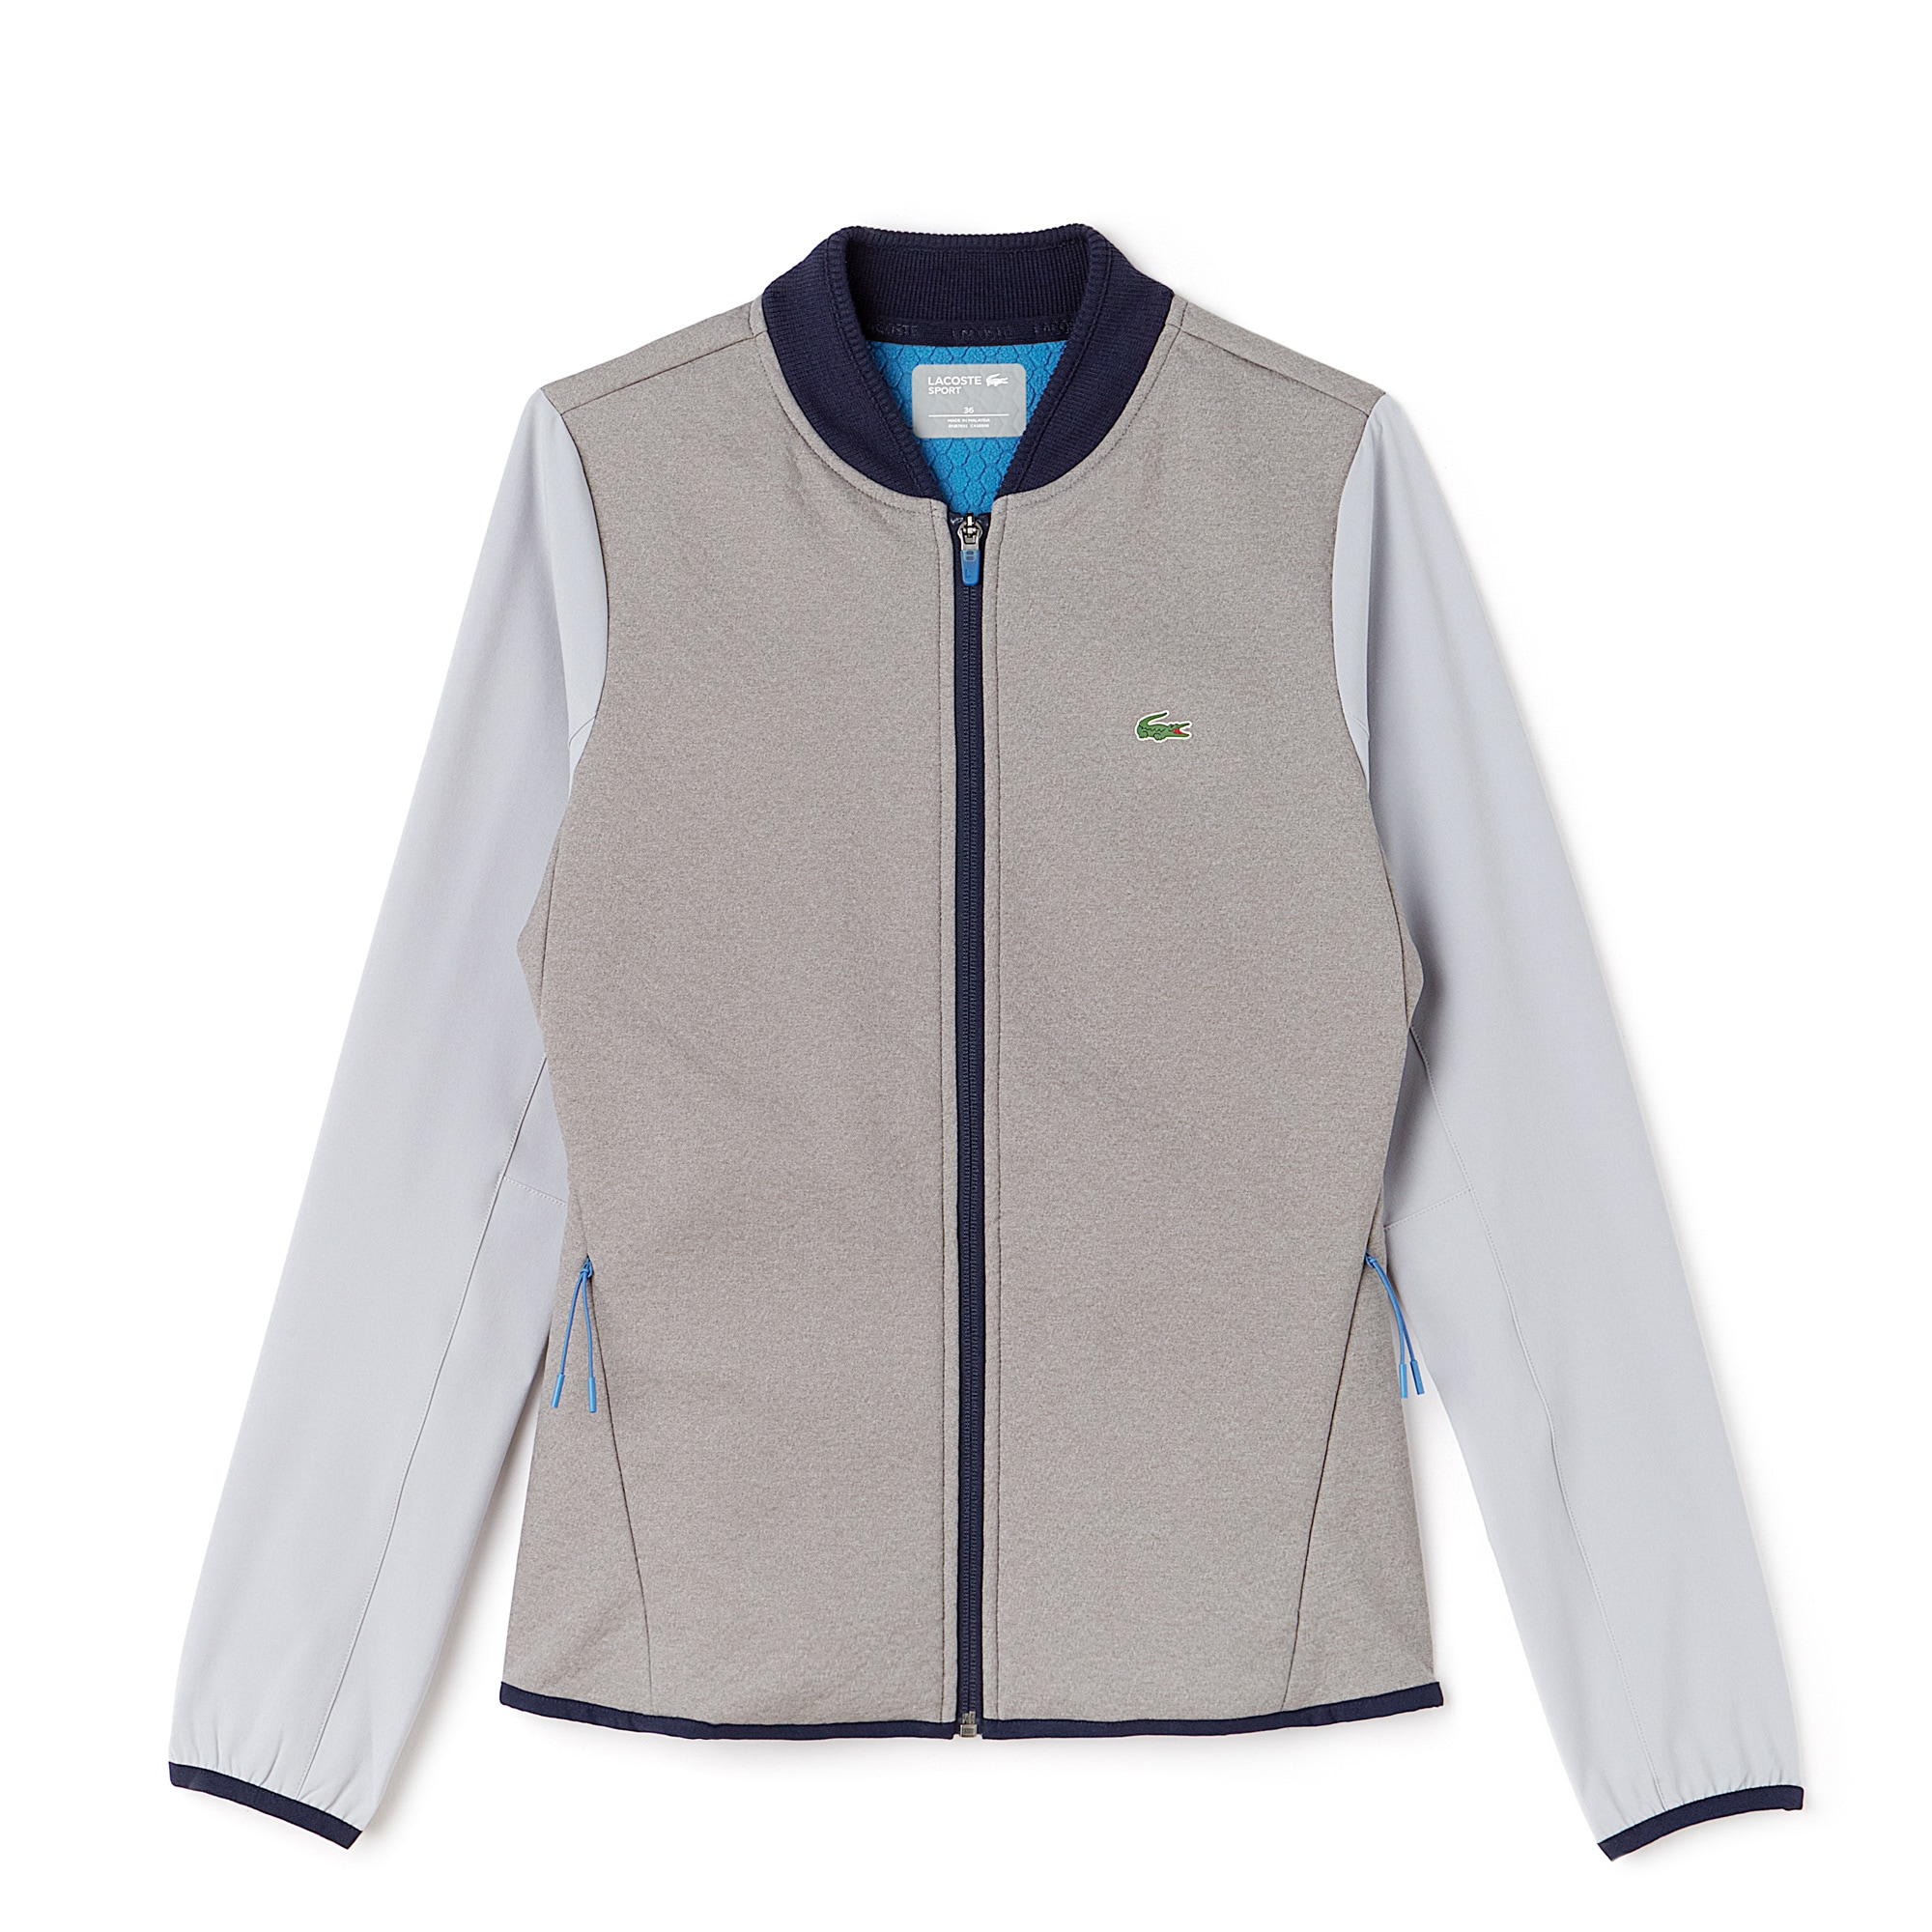 Lacoste SPORT Golf-sweatshirt dames met waterbestendige middenlaag en rits